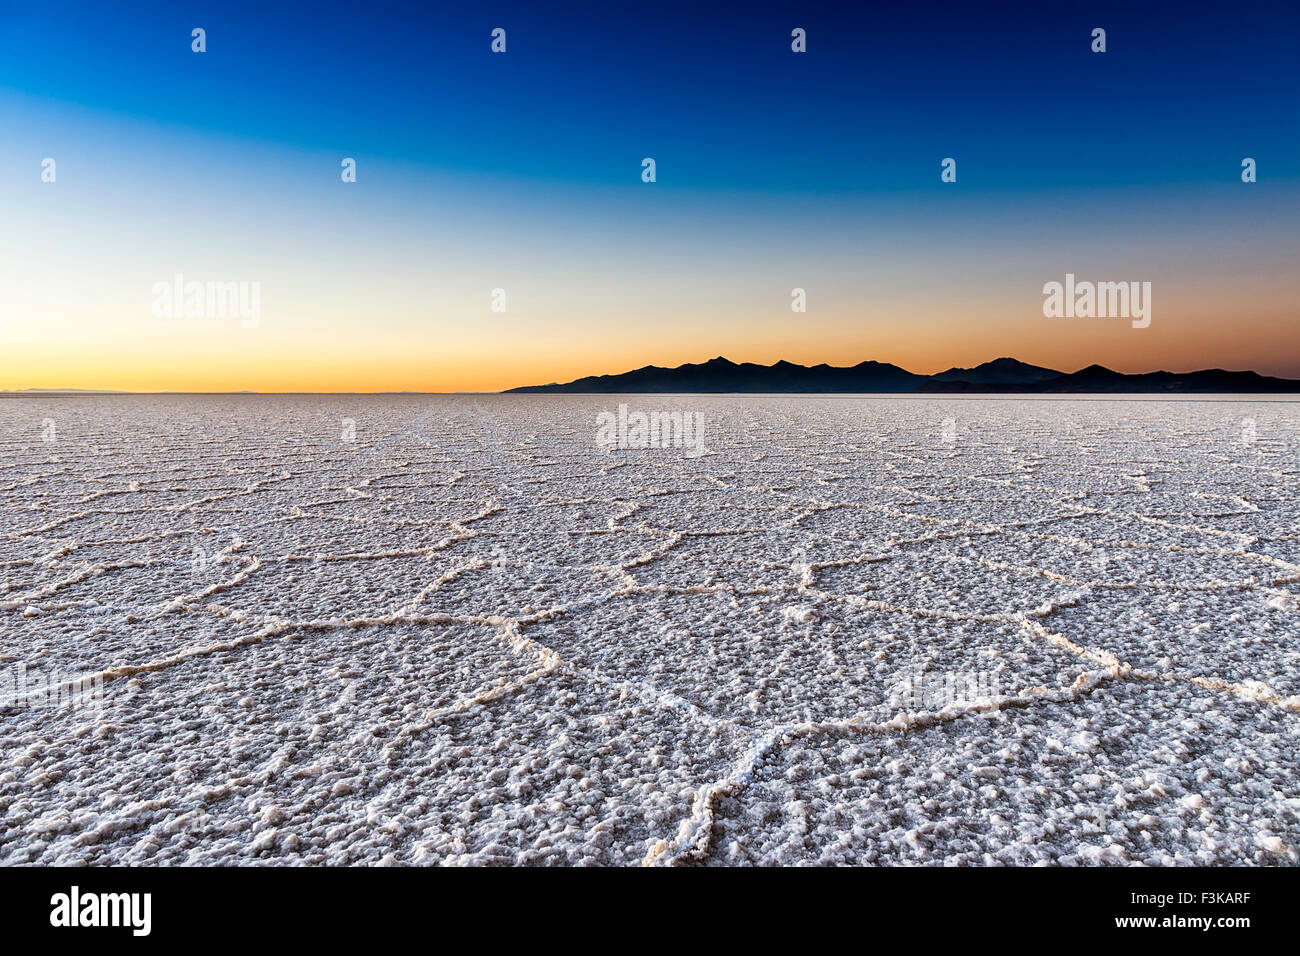 Sunrise in the Salar de Uyuni, Bolivia - Stock Image